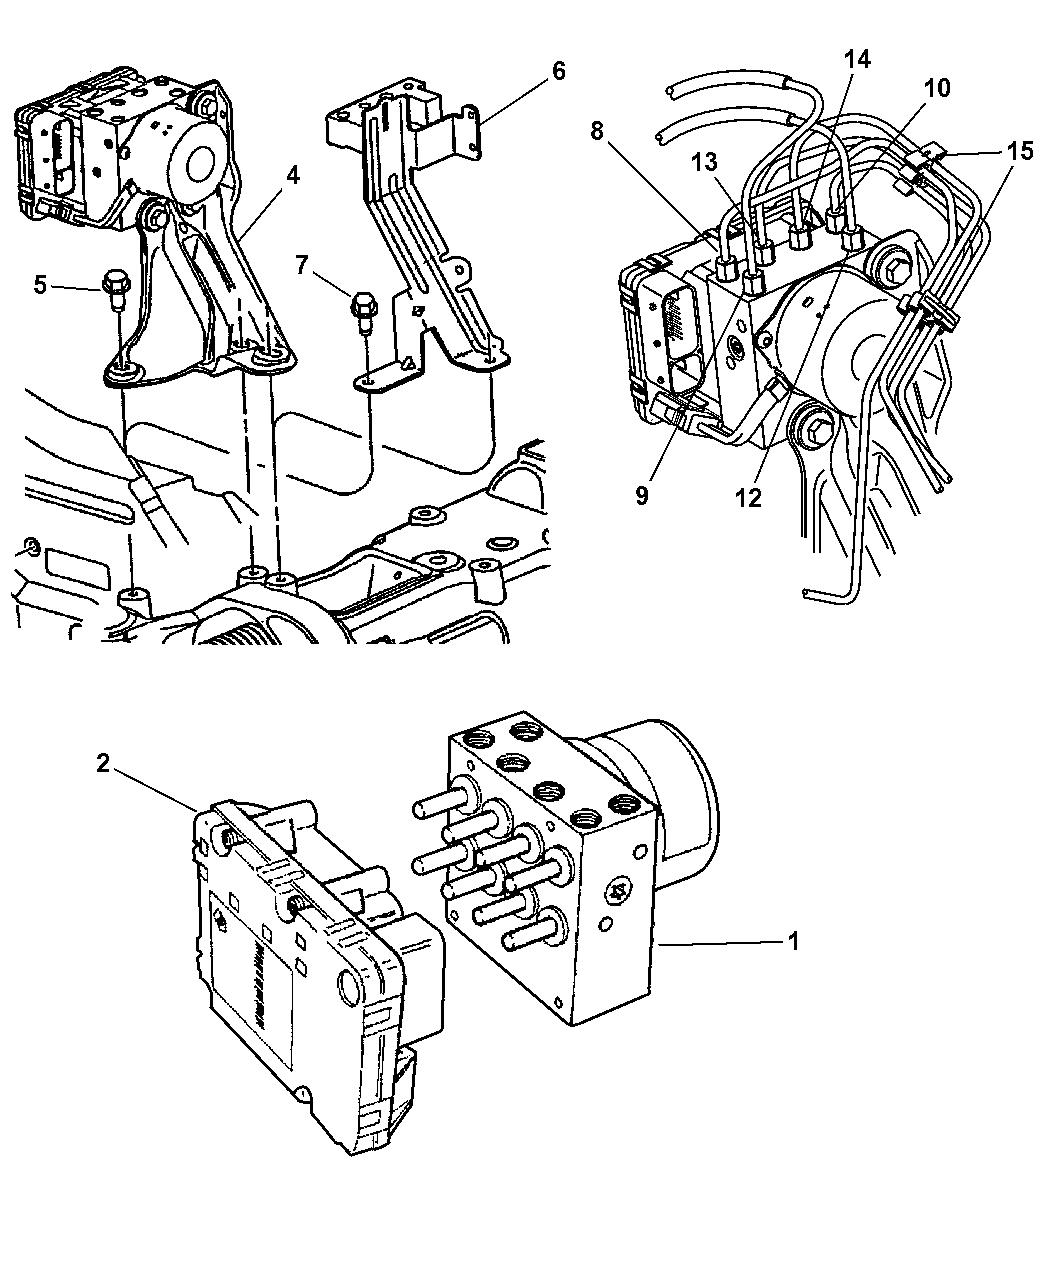 Genuine Chrysler CONTROL-ANTI-LOCK BRAKES